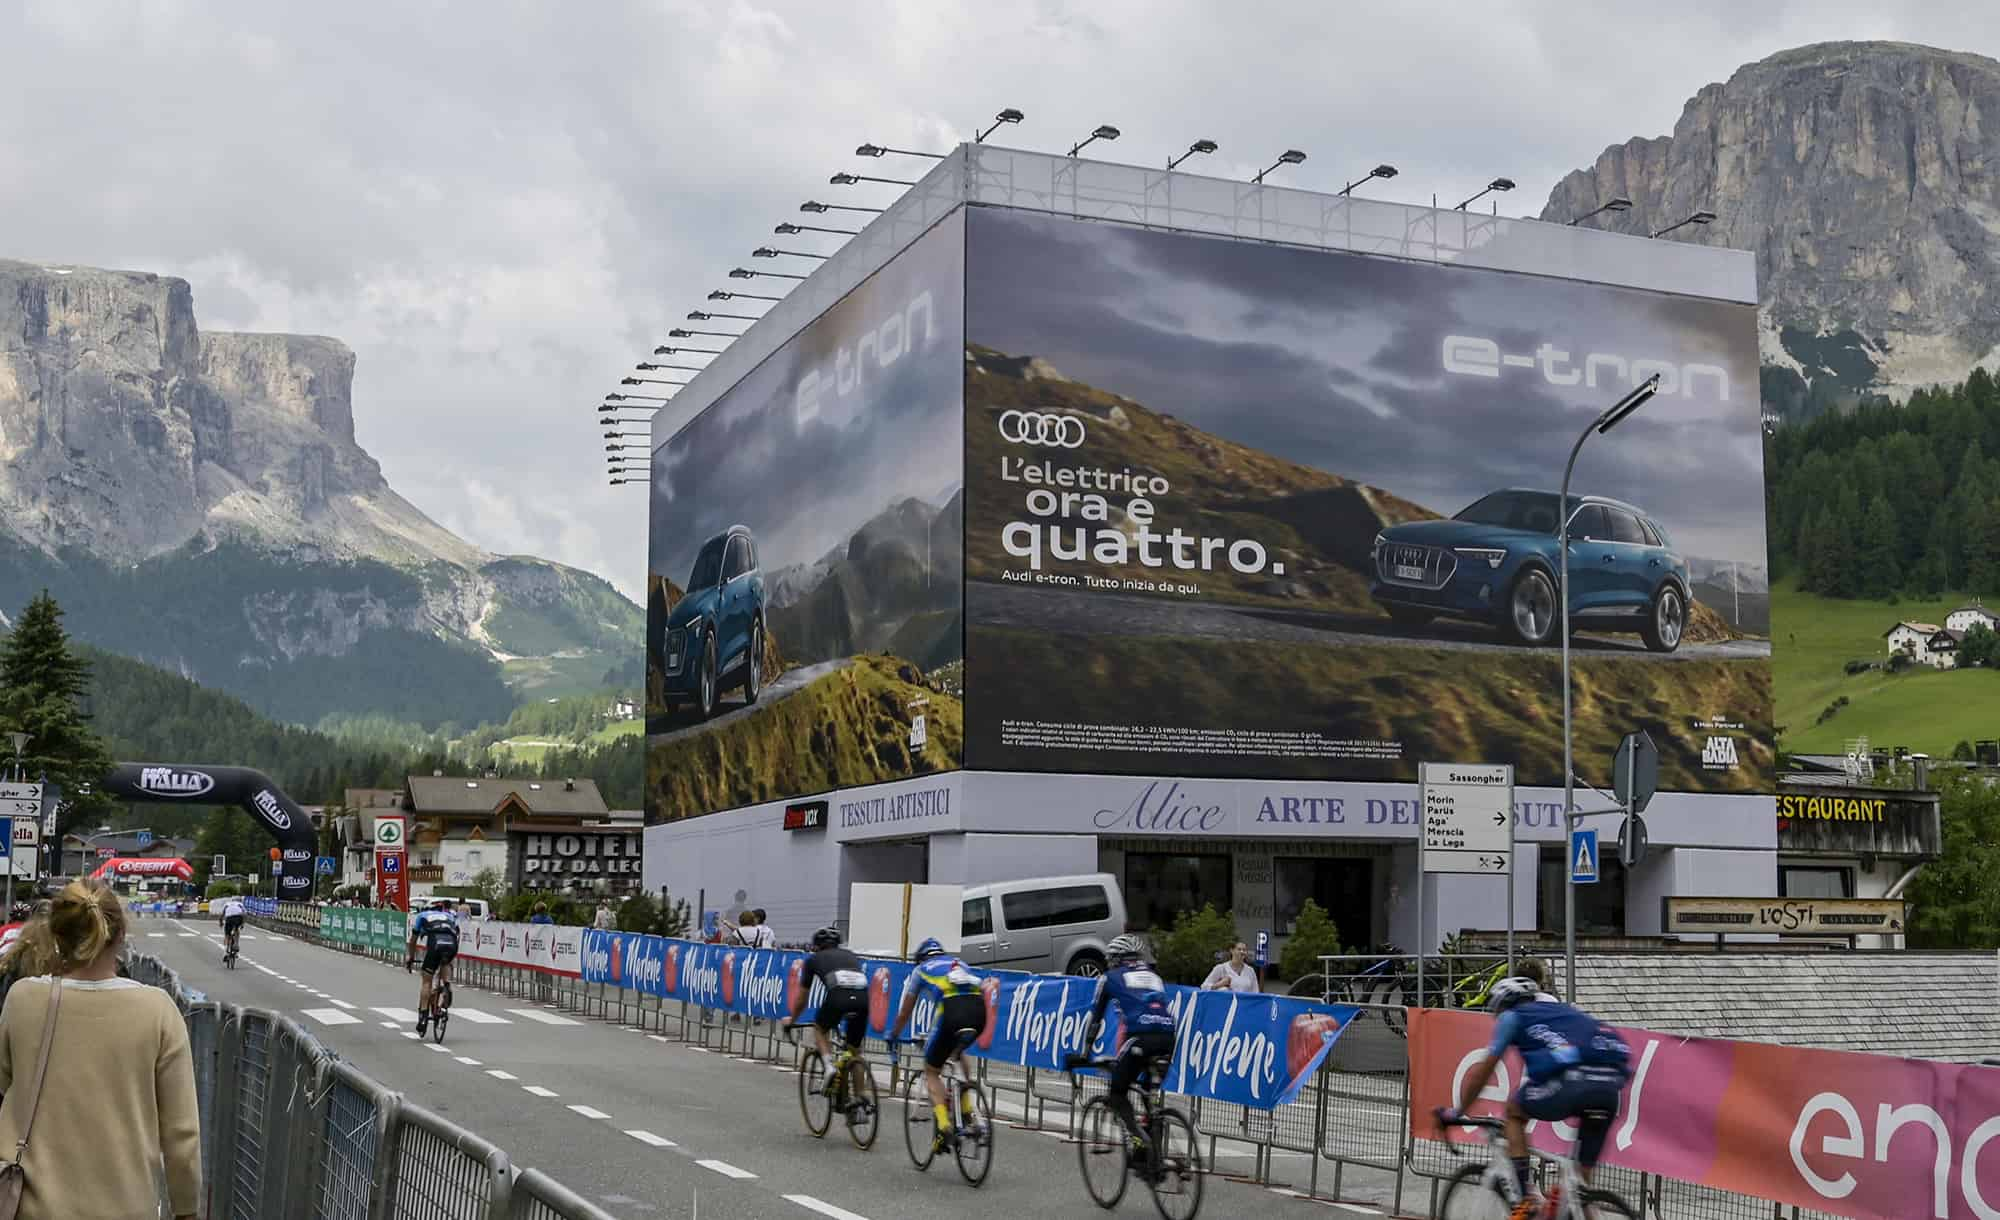 Maxi Affisione a Corvara in Alta Badia 4